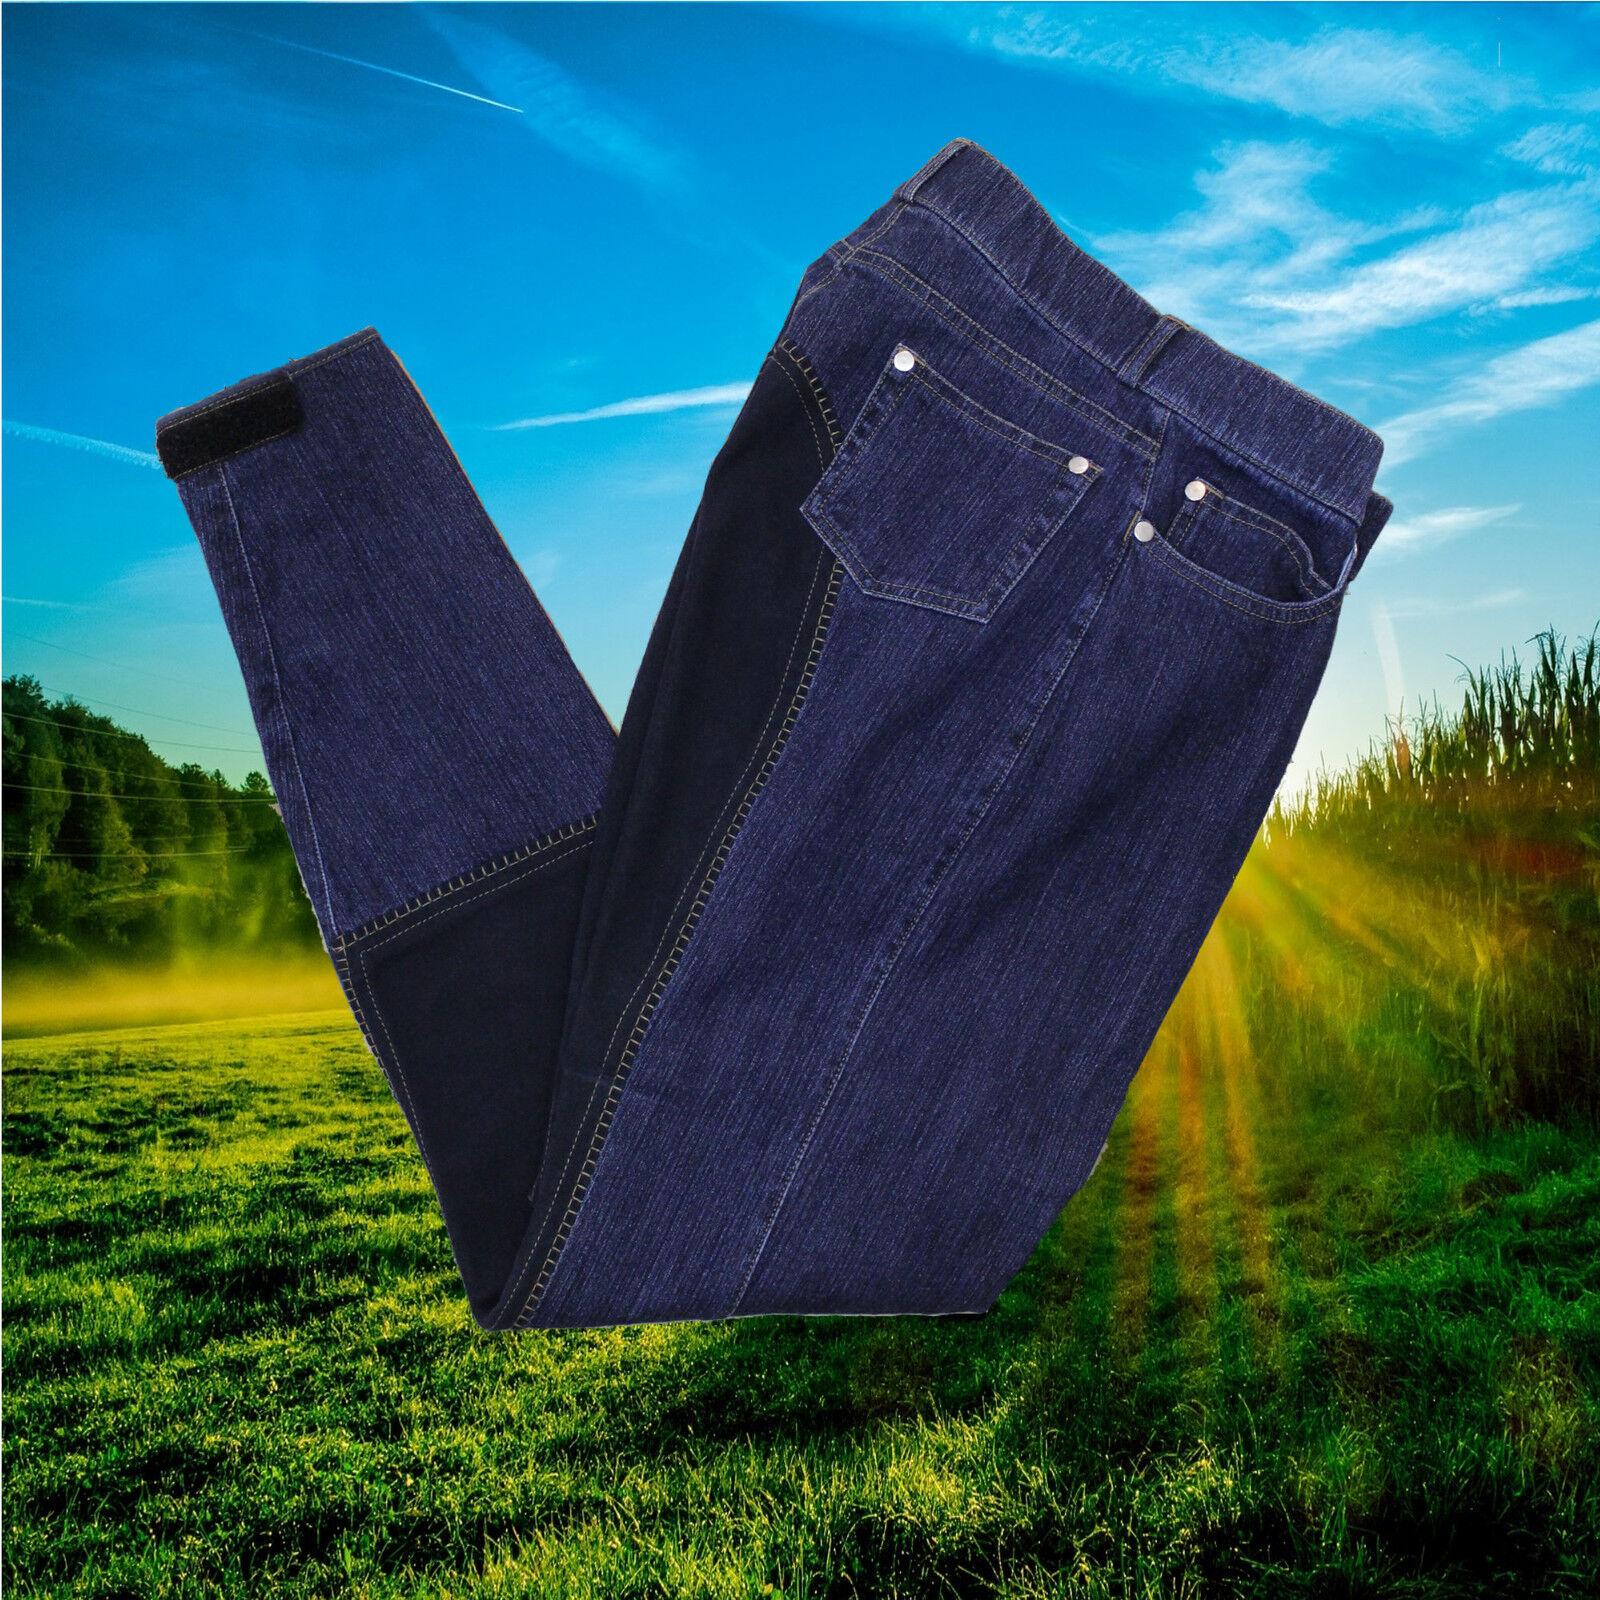 HKM Reithose Jeans, Stiefelreithose, jeans blau, Ganzbesatz, jeans Stiefelreithose, d46310